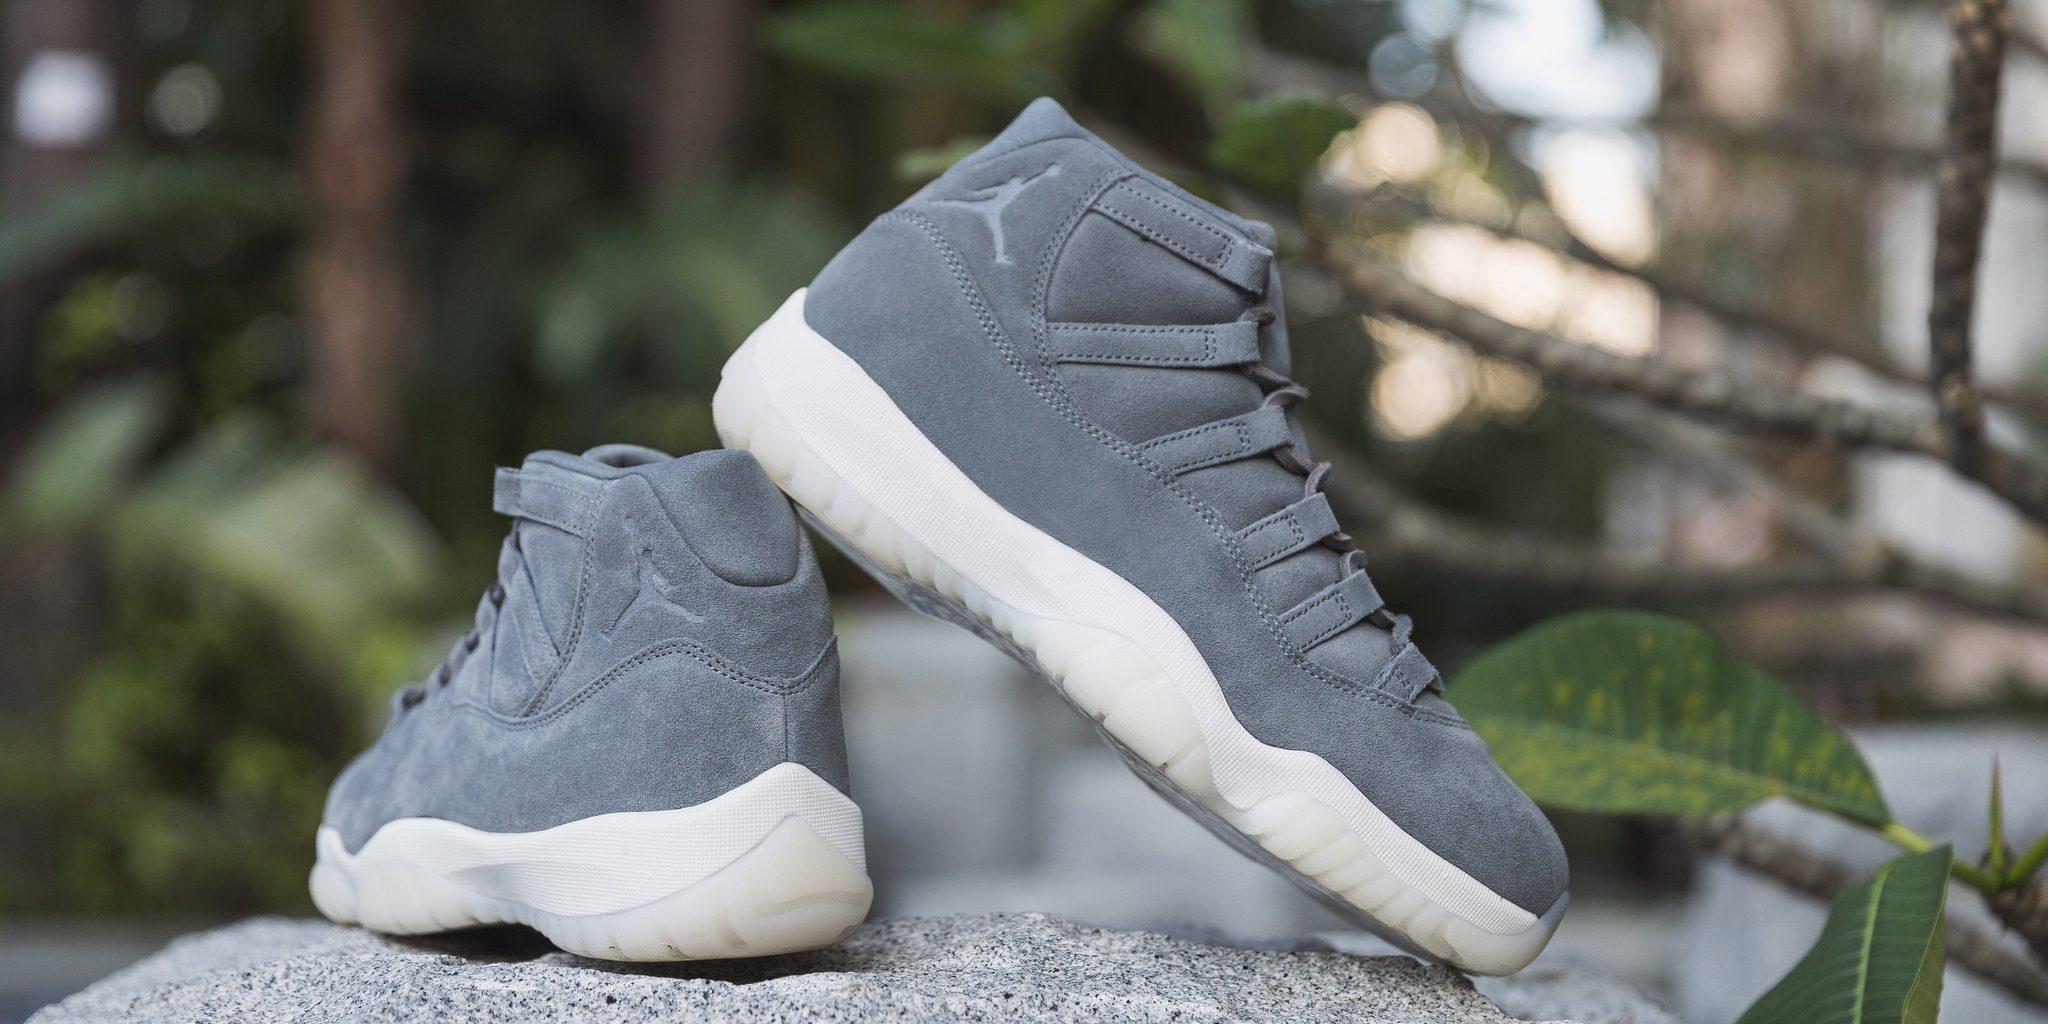 adfa9b91f1a Post navigation. PreviousPrevious post:Sole Protector™ For Your Nike Air  Jordan [11] ...